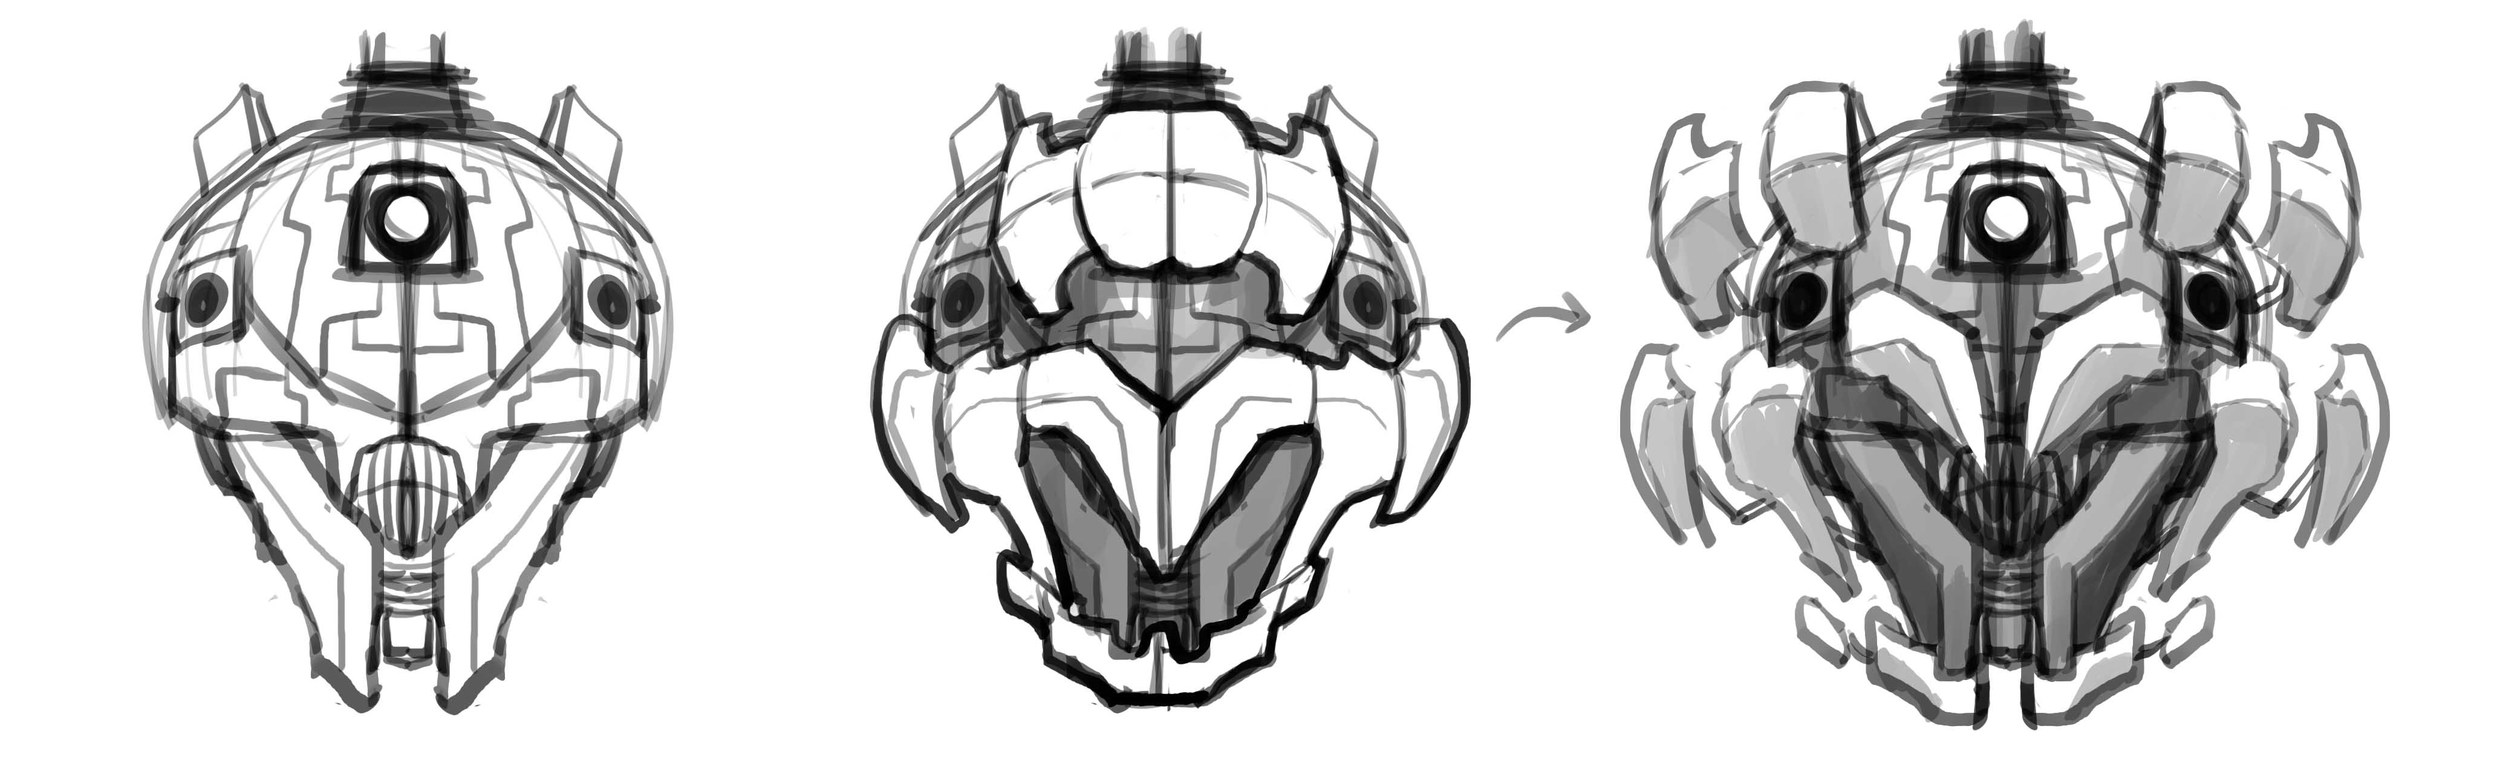 Enemy (Concept Design)